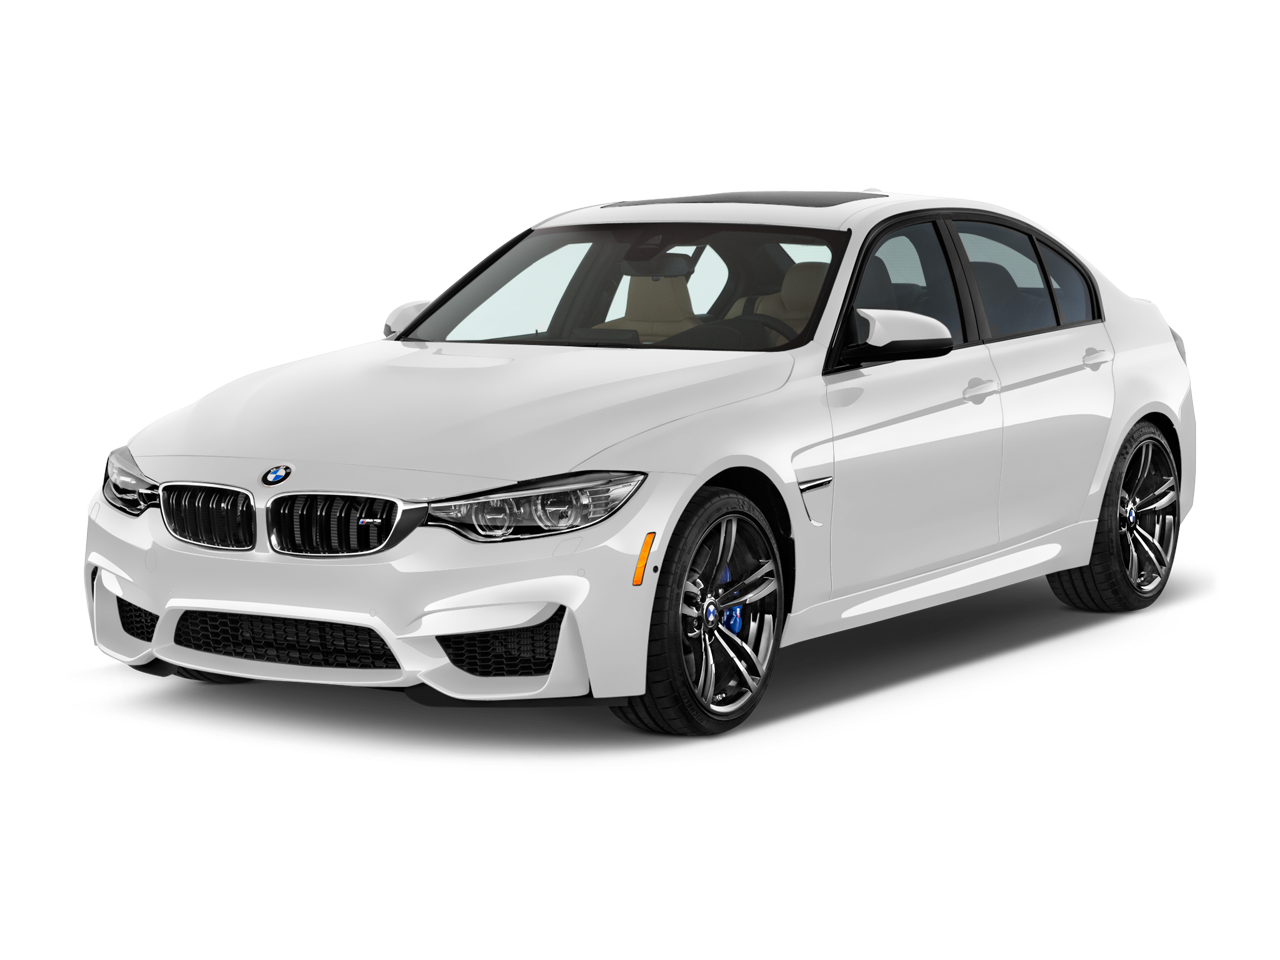 Bmw 335I Convertible >> BMW M3 Reviews - ProductReview.com.au